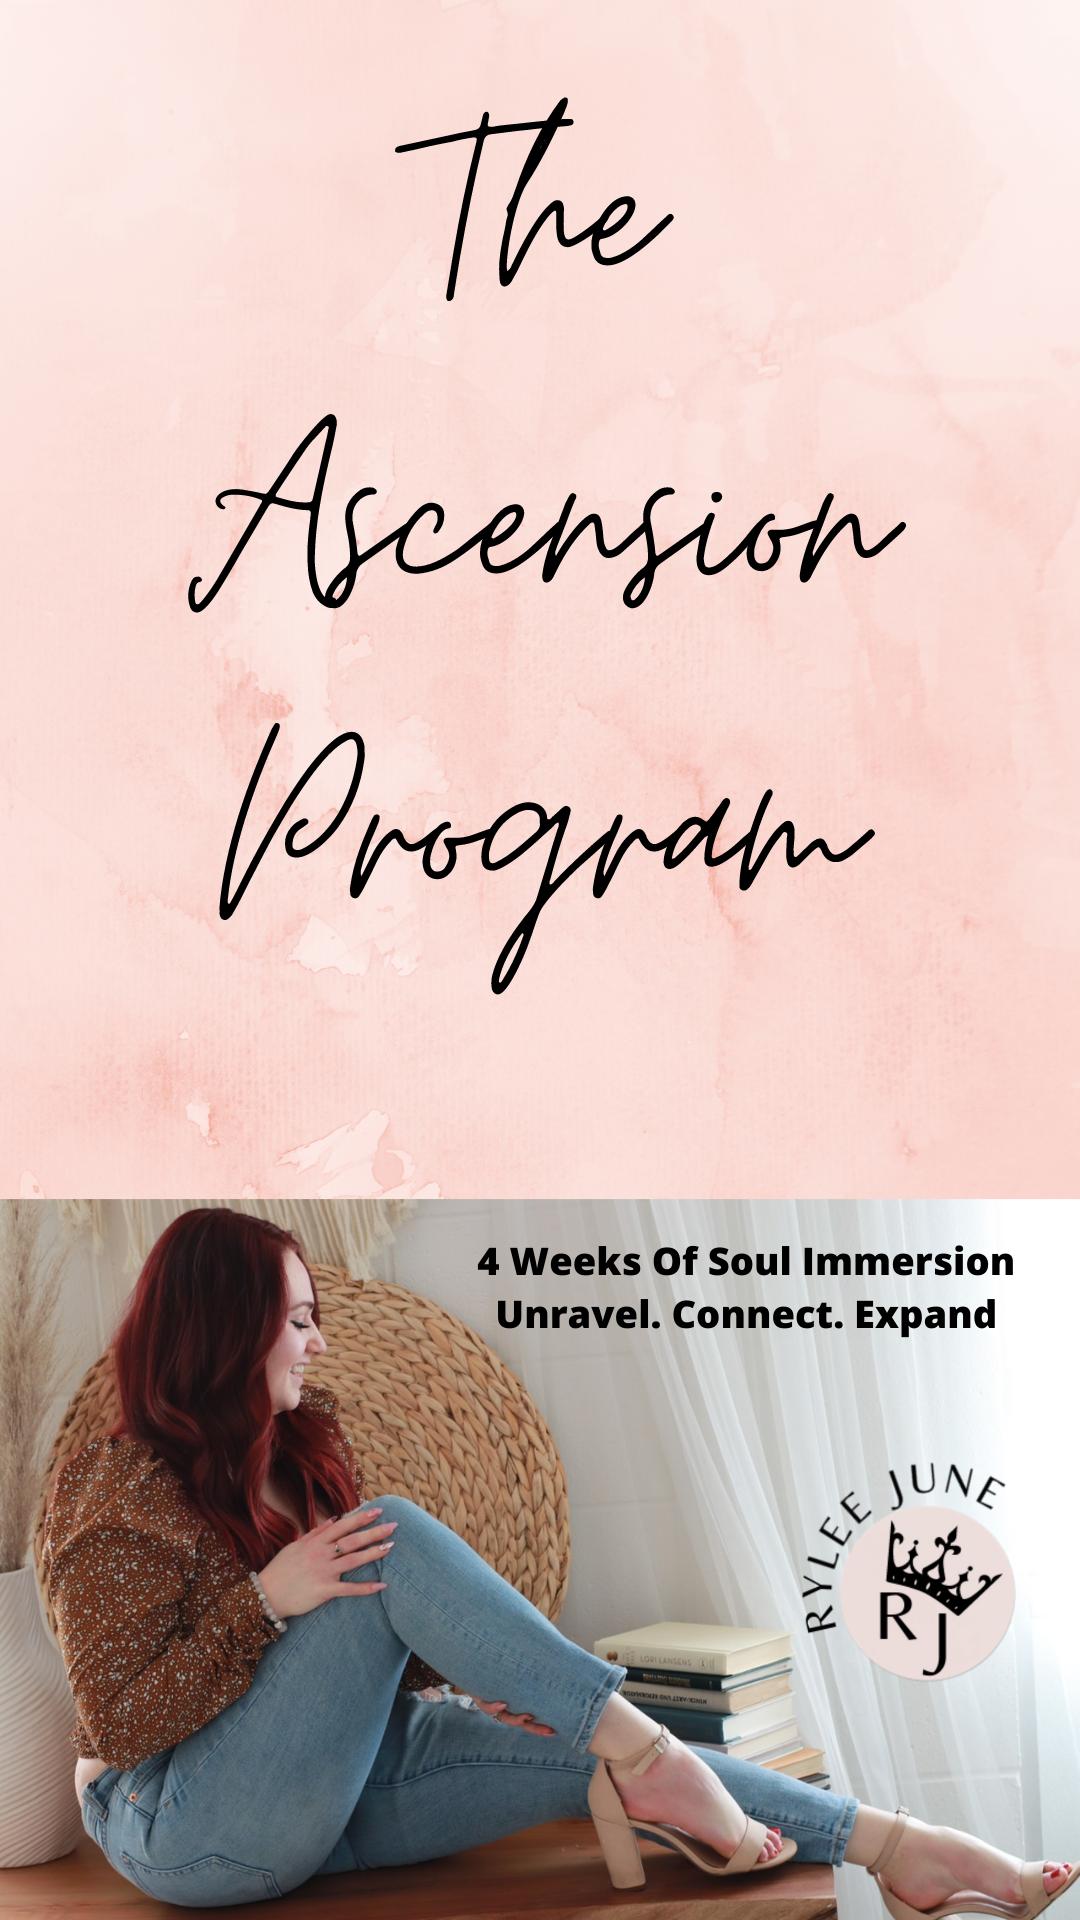 The Ascension Program